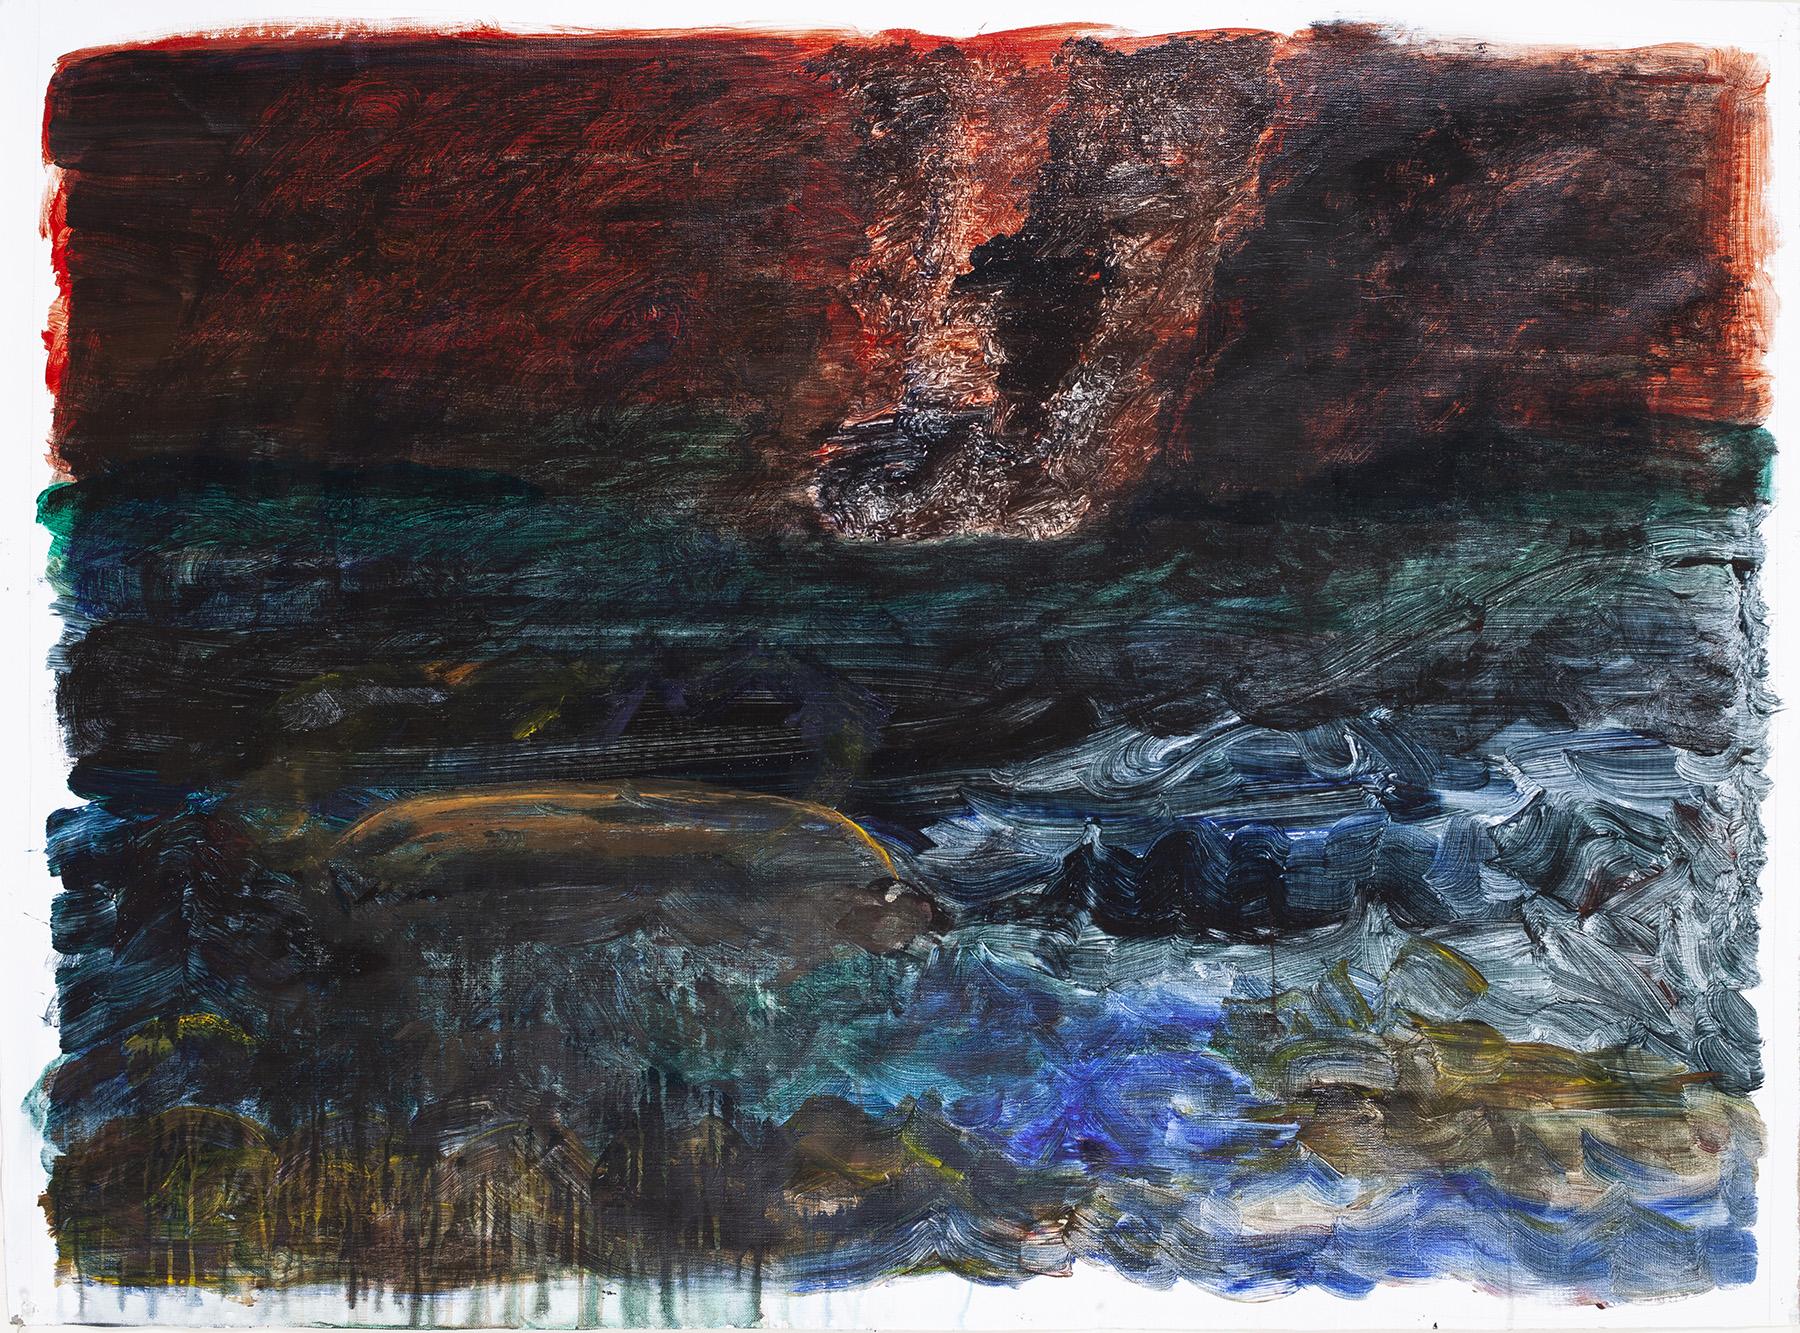 8.) Ono, Boat Sinking. 2018.  Acrylic on canvas, 38.25 in x 53 in (97.2 cm x 134.6 cm) copy.jpg